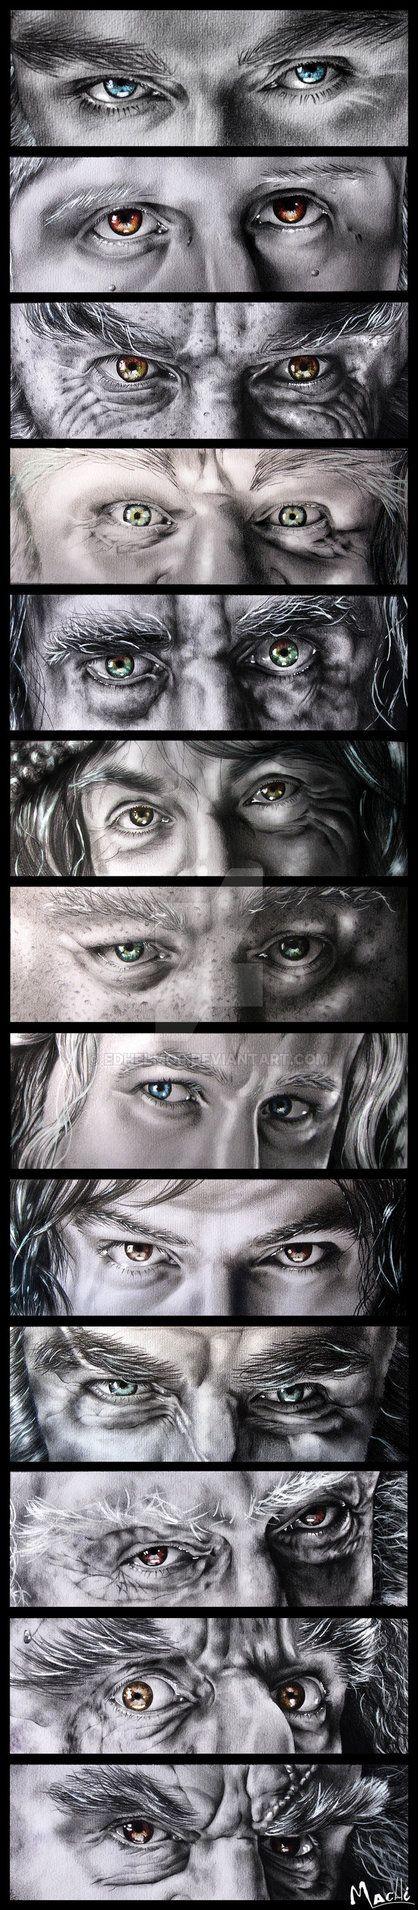 The Dwarves eyes. Thorin, Ori, Nori, Dori, Bifur, Bofur, Bombur, Fili, Kili, Dwalin, Balin, Oin e Gloin... <3 Realized with a lot of lapis ^^